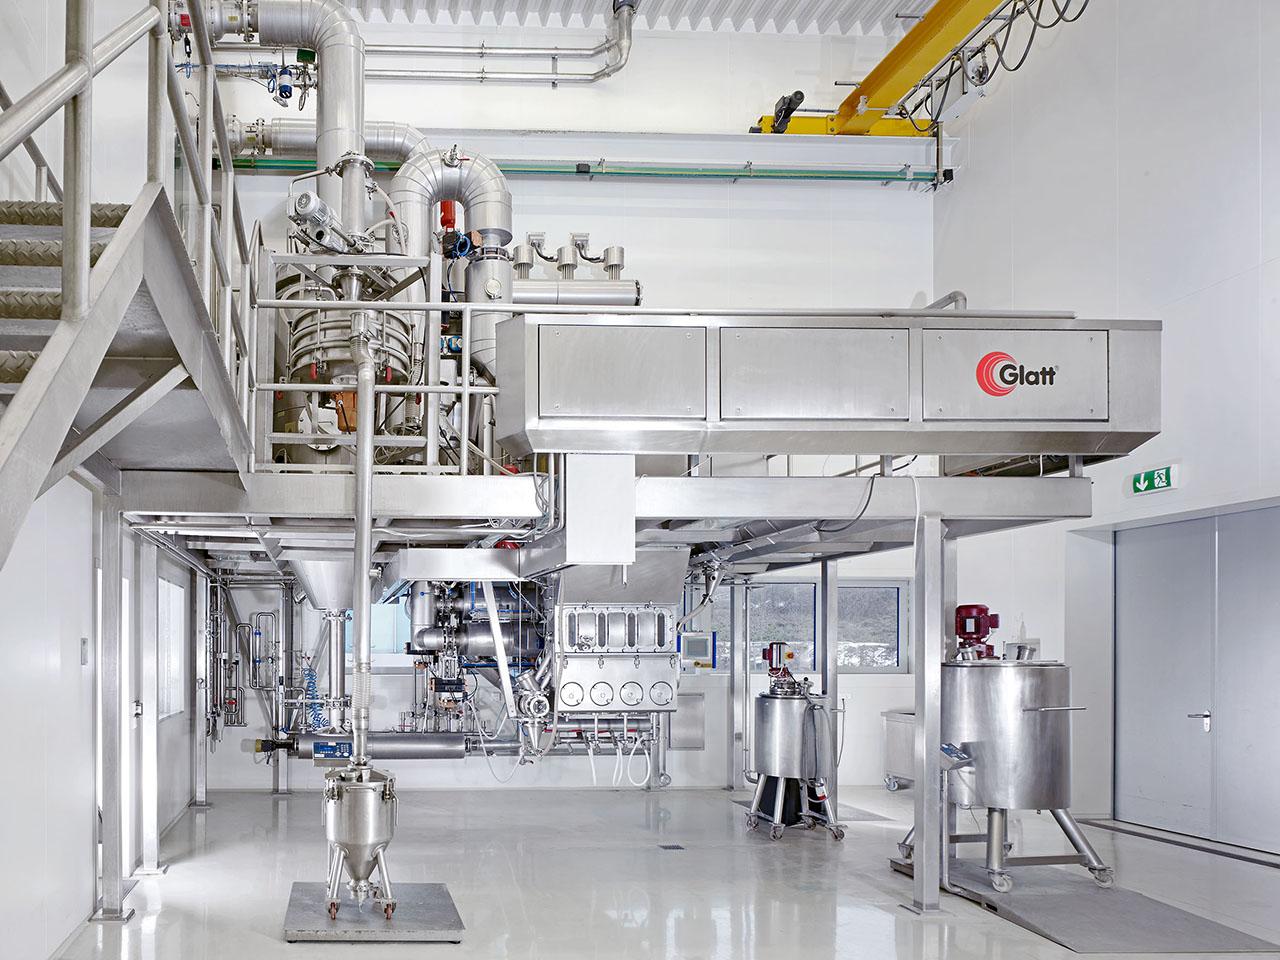 Fluid bed/spouted bed pilot plant in Glatt Ingenieurtechnik's technology center in Weimar, Germany